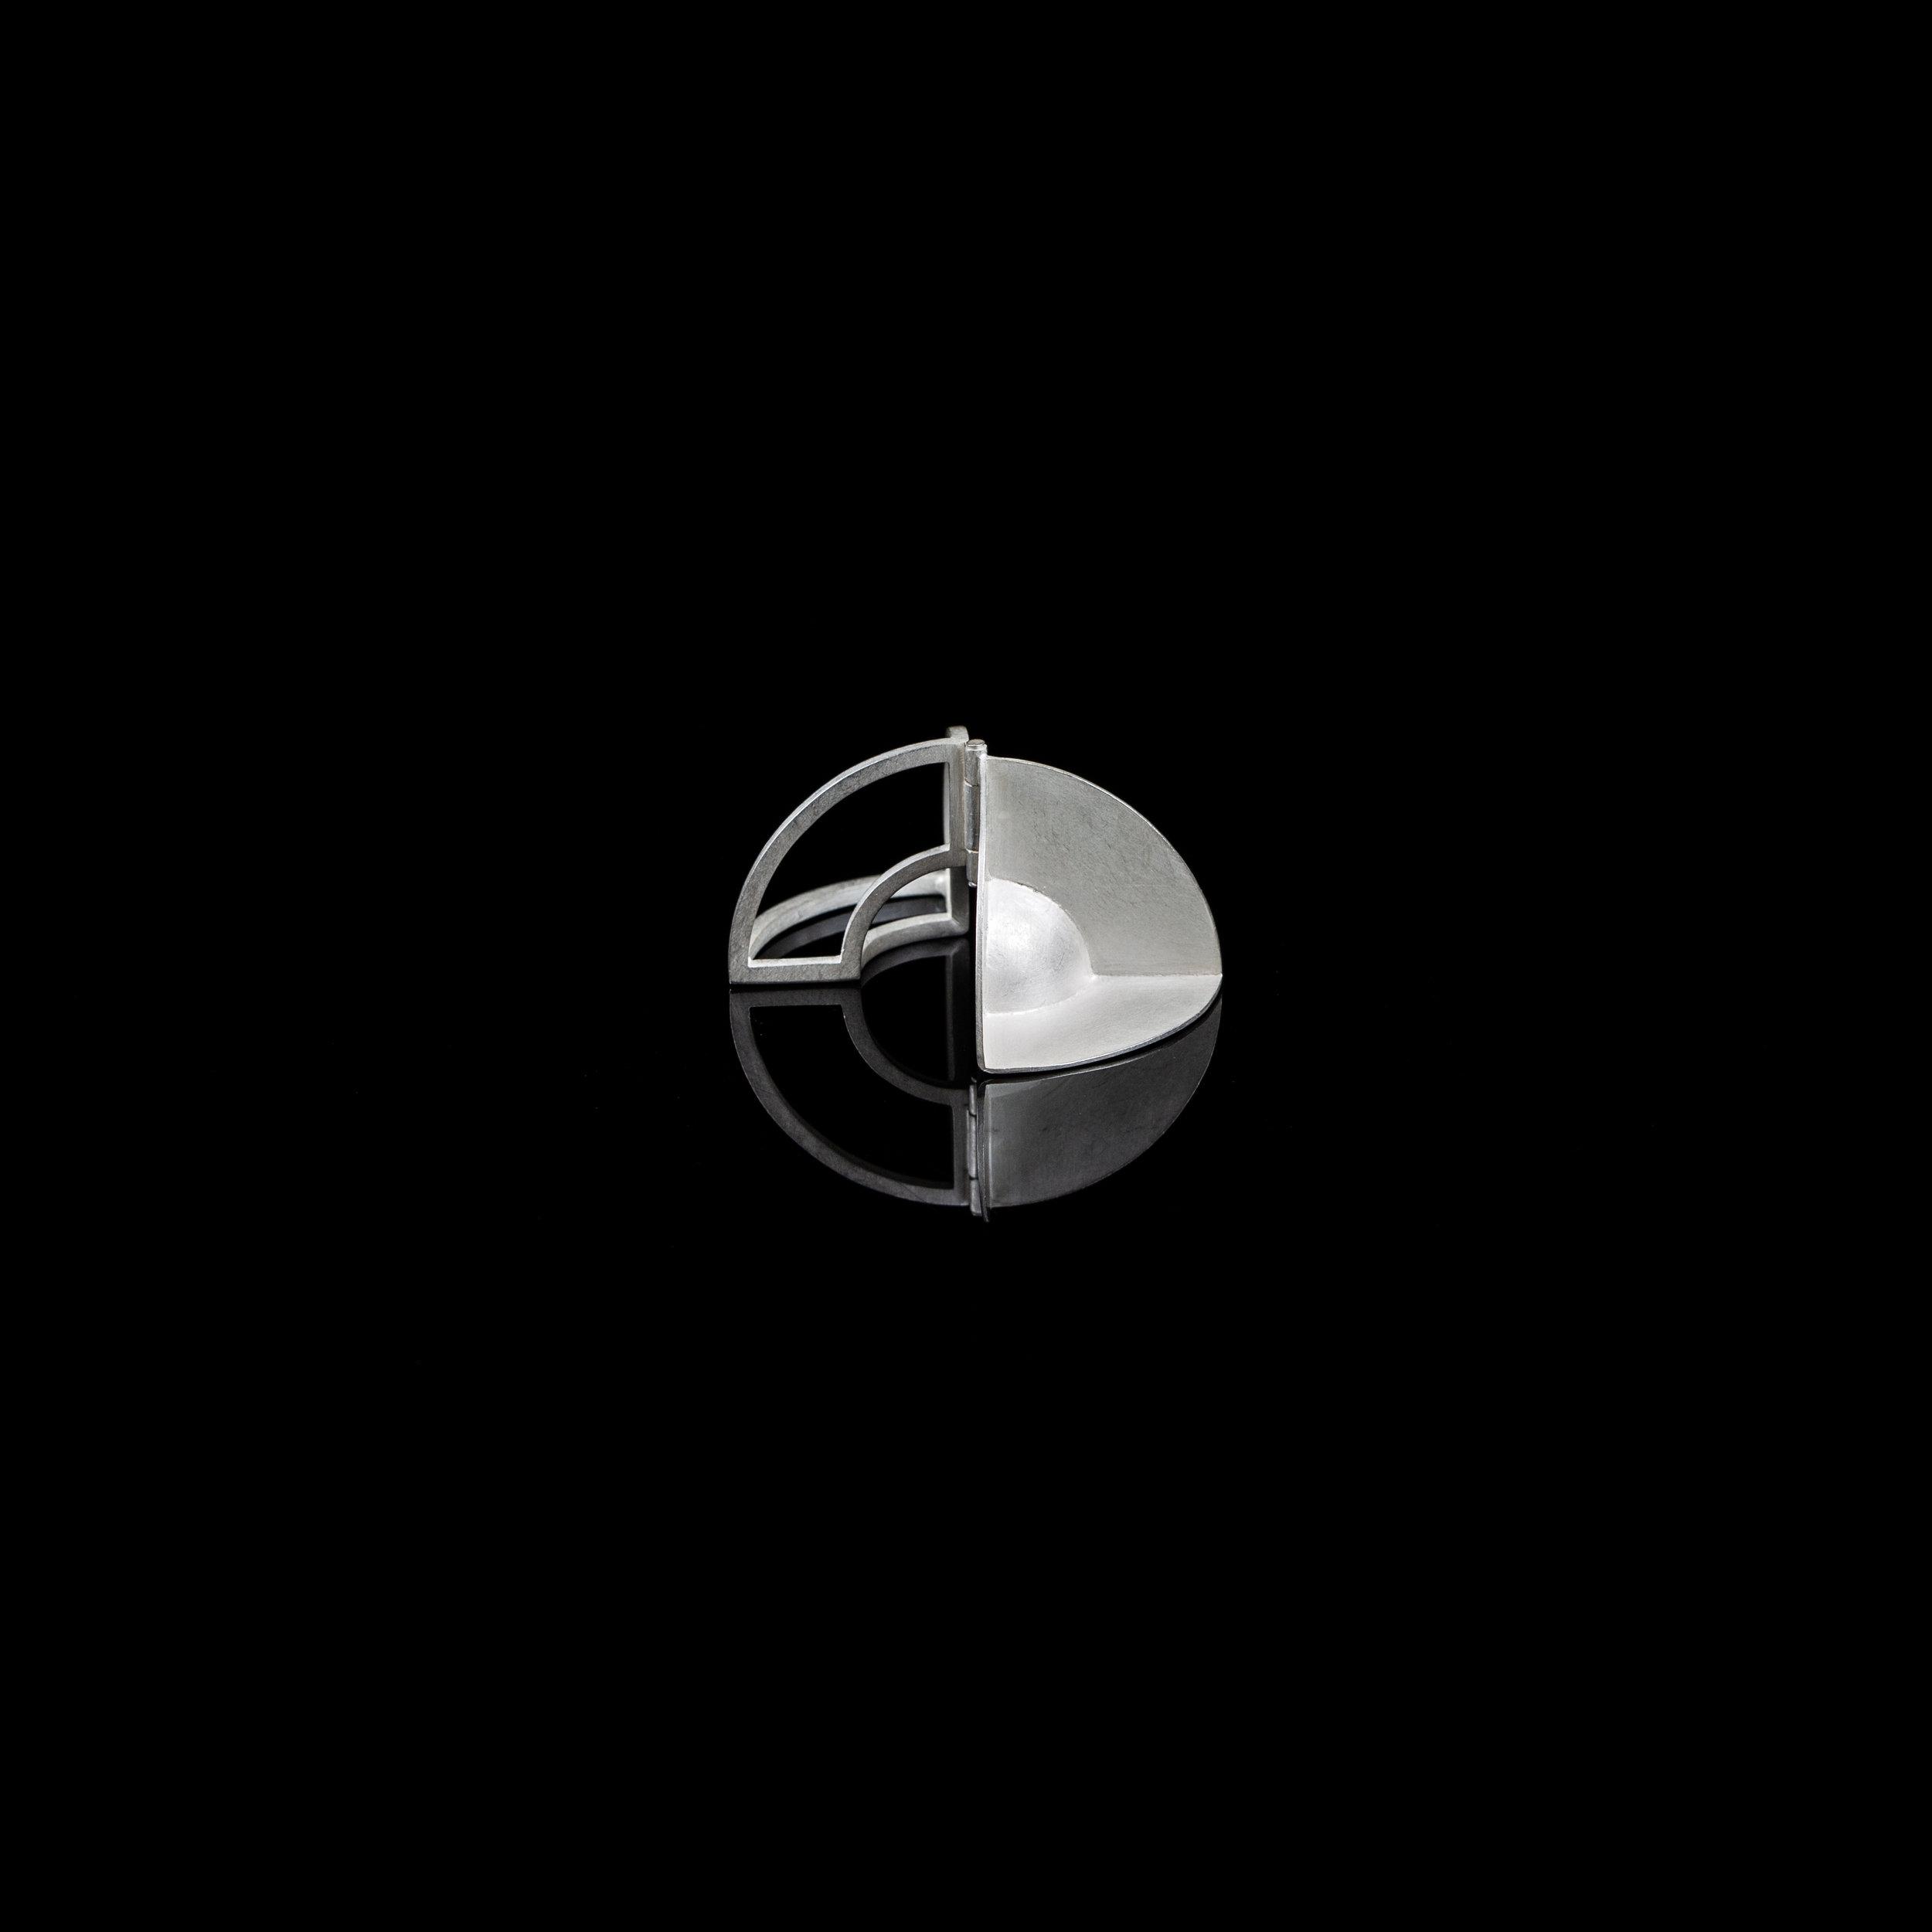 Curious Constructions | Pendant   Sterling Silver |4.2 x 2.1 x 2.1 cm